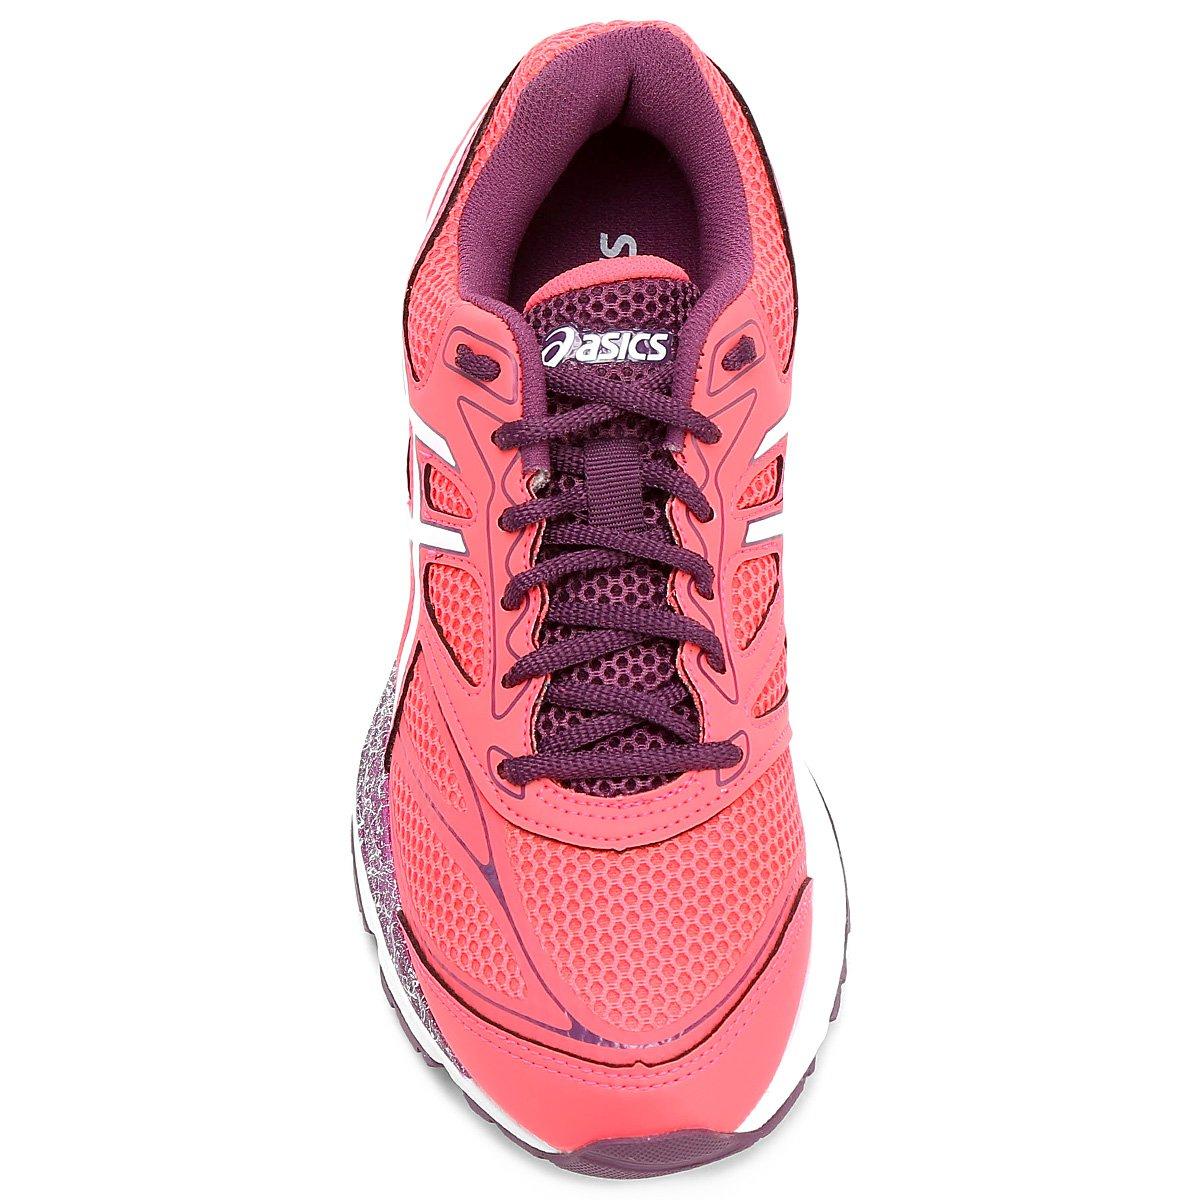 8 Pink e Feminino Gel Pulse Tênis A Asics Branco 6ApxtO ... c8ab257fb5838